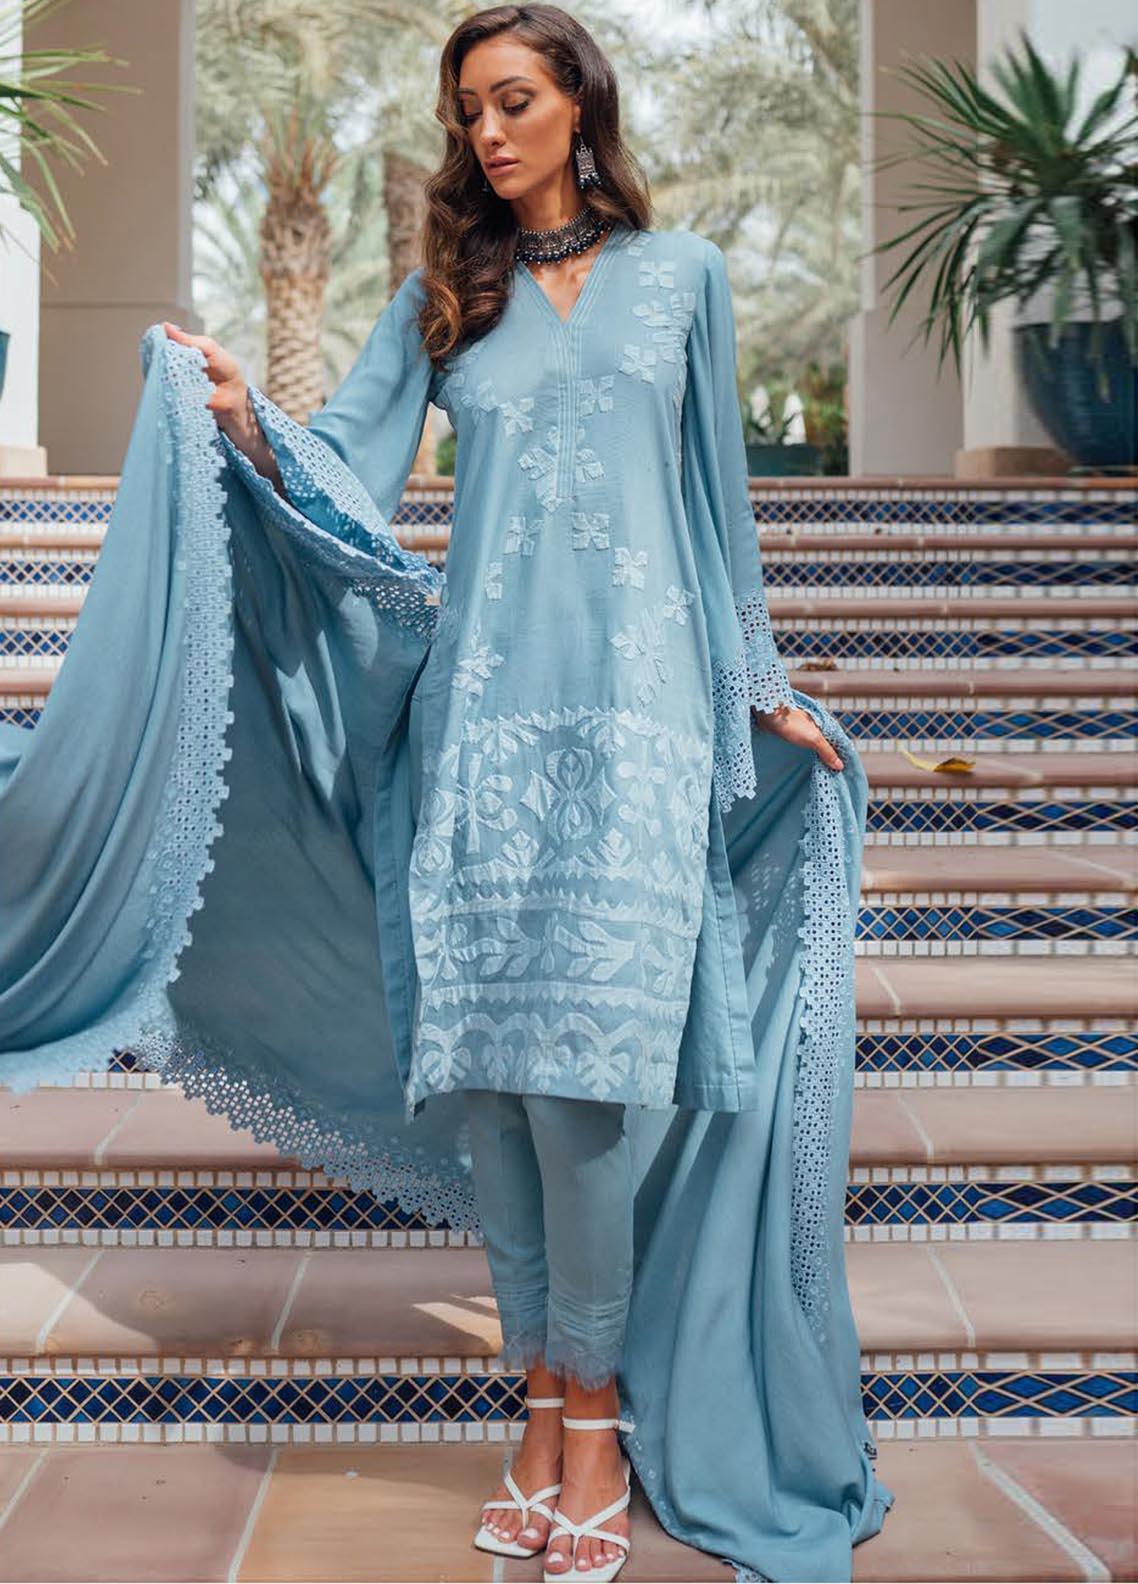 Saira Rizwan Embroidered Cotton Karandi Suit Unstitched 3 Piece 09 FIRUZEH – Winter Collection